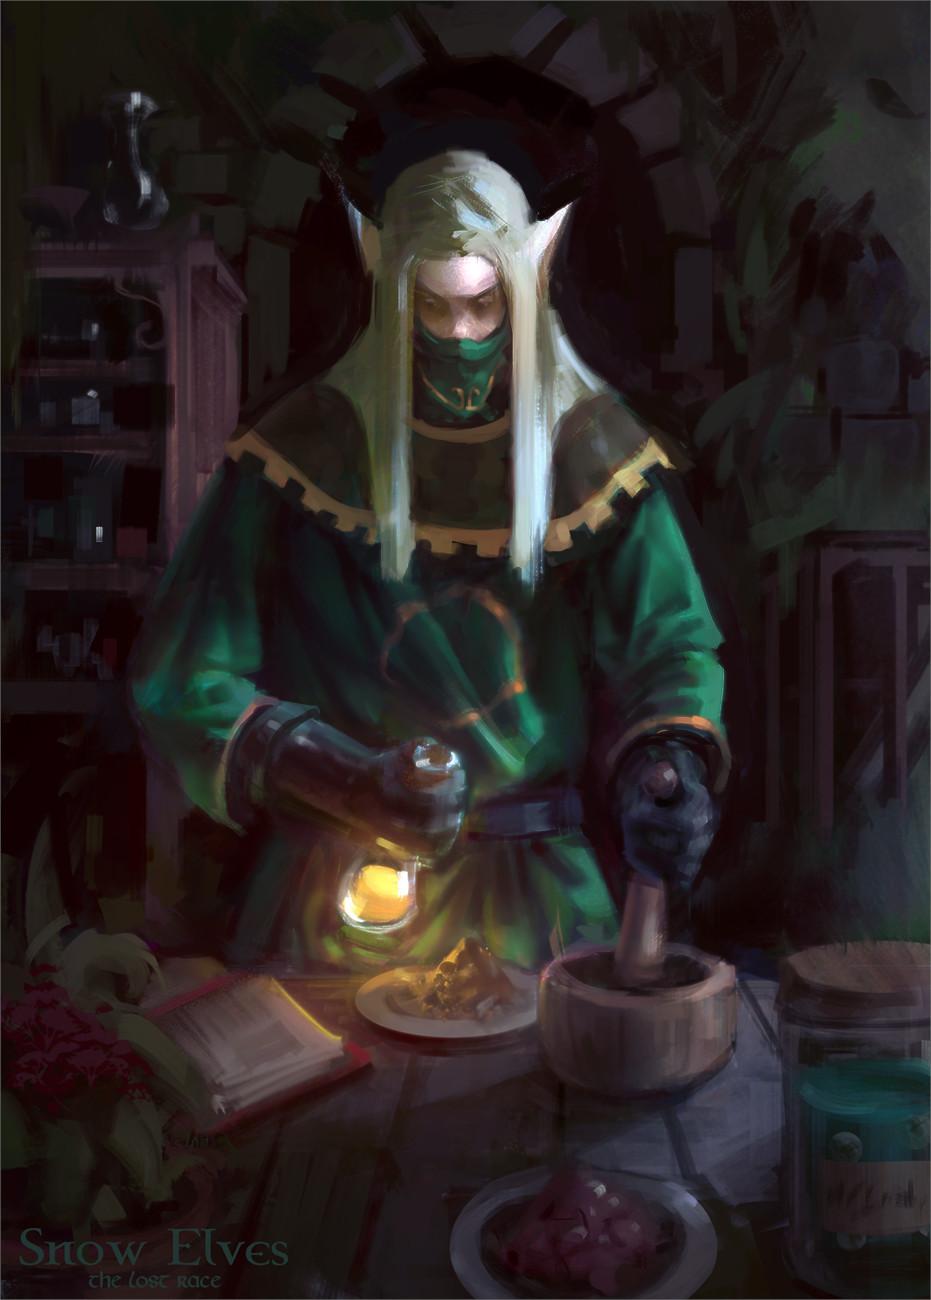 Snow Elves - The Alchemist